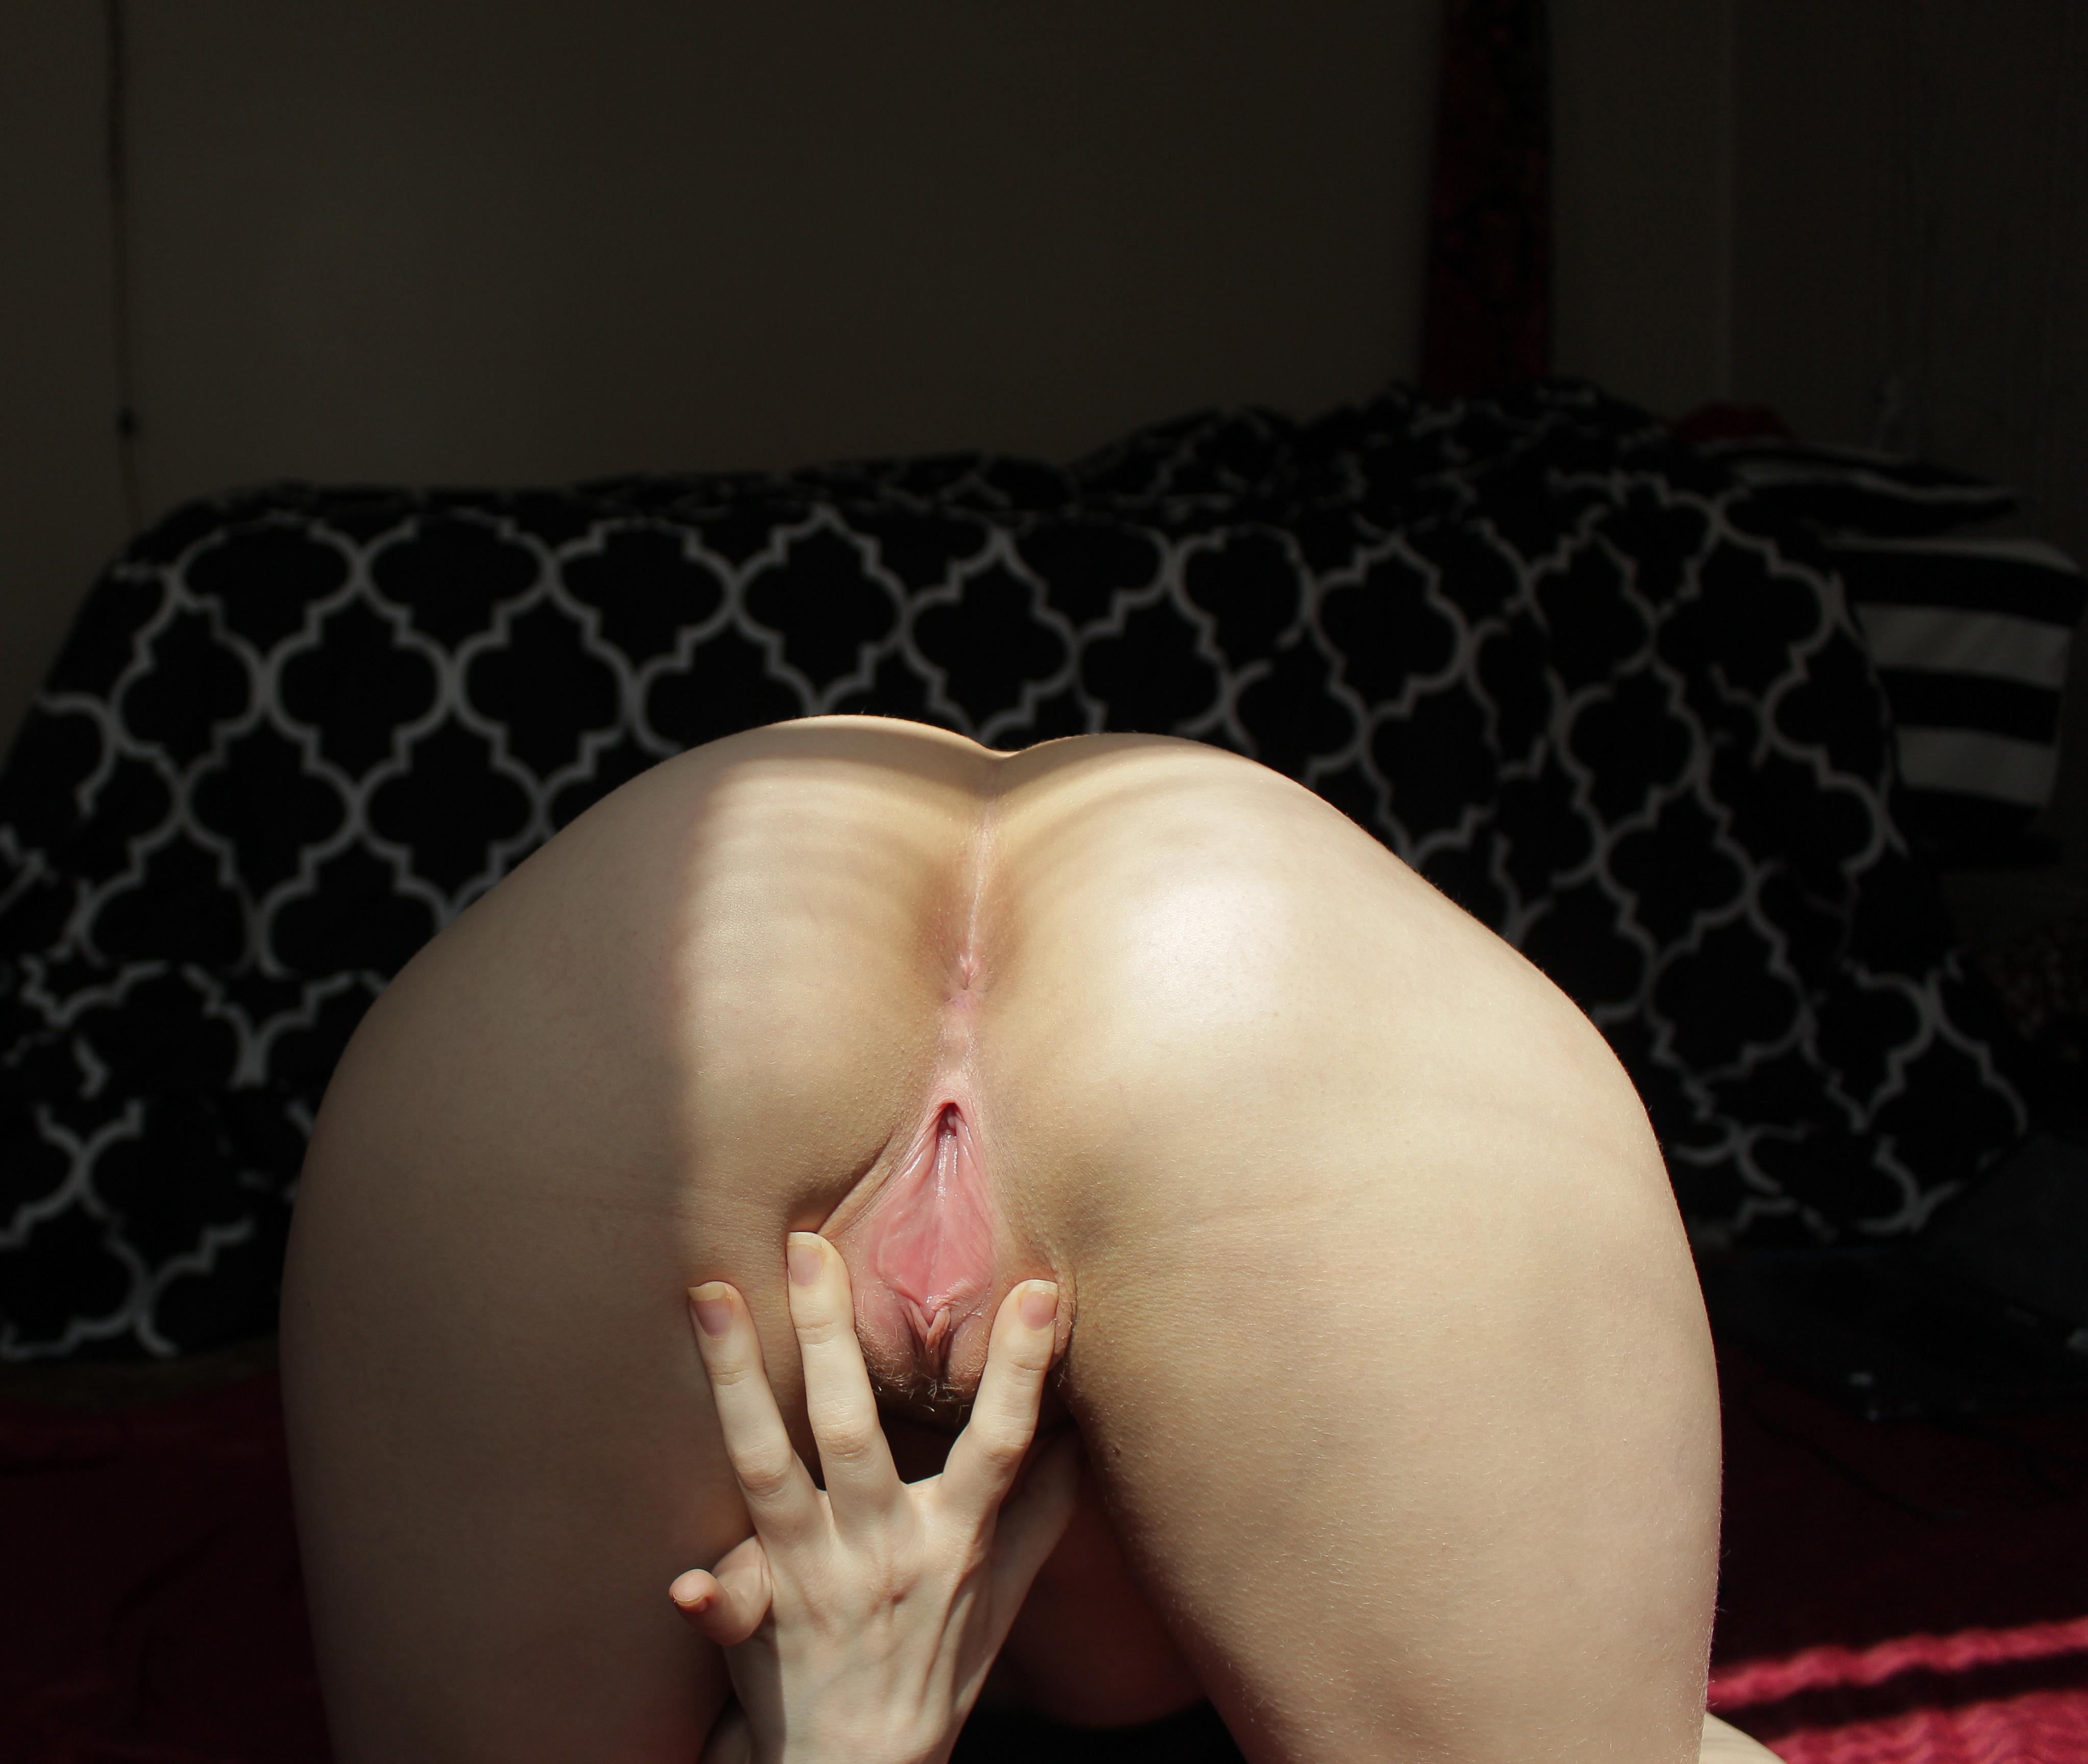 Butt Pussy